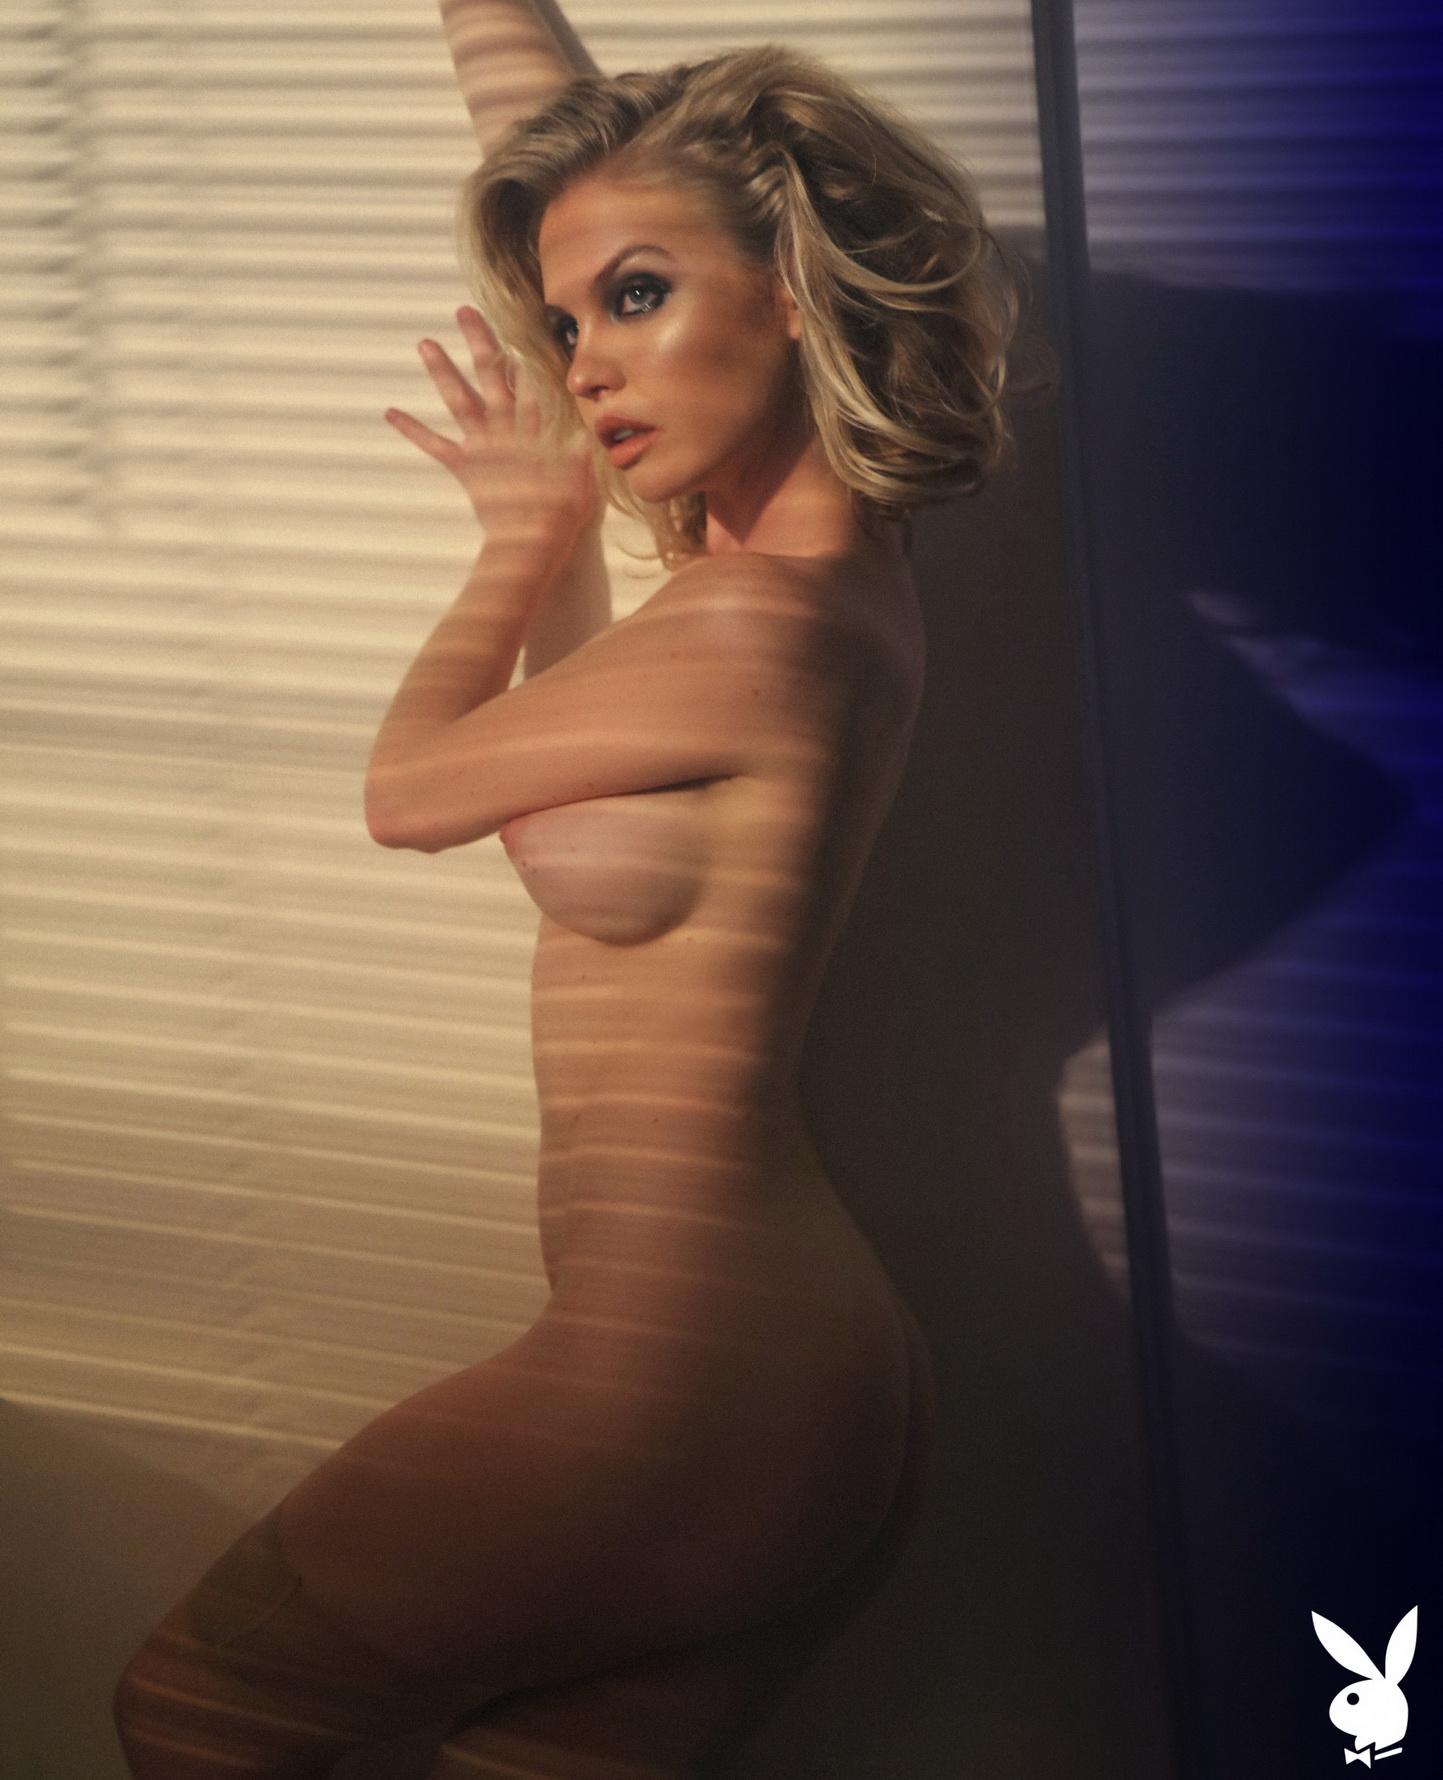 [Playboy Plus] Kayslee Collins - Private Showing[25P] - 貼圖 - 歐美寫真 -